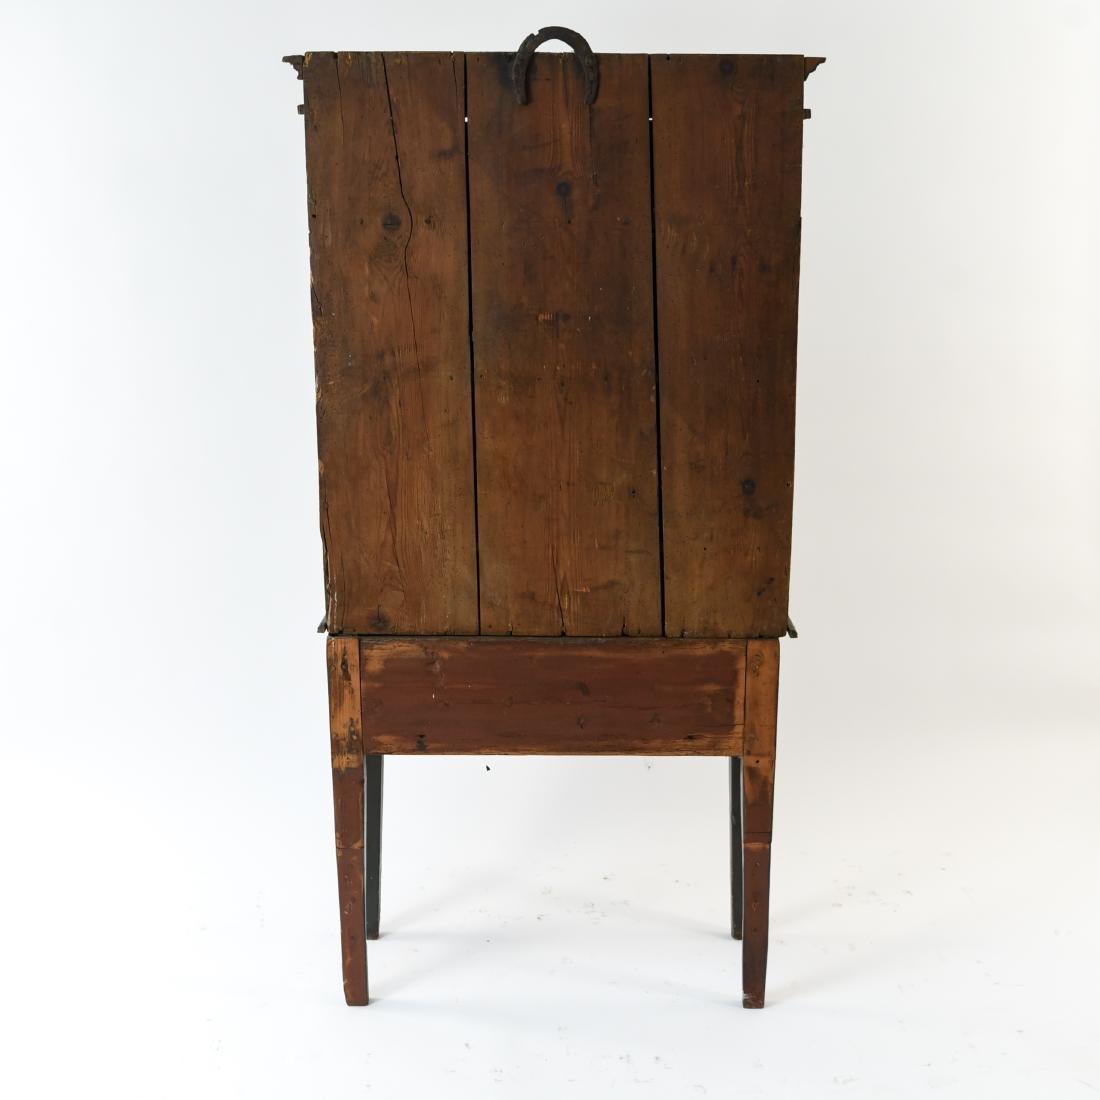 ANTIQUE SWEDISH PAINTED CUPBOARD C. 1837 - 10